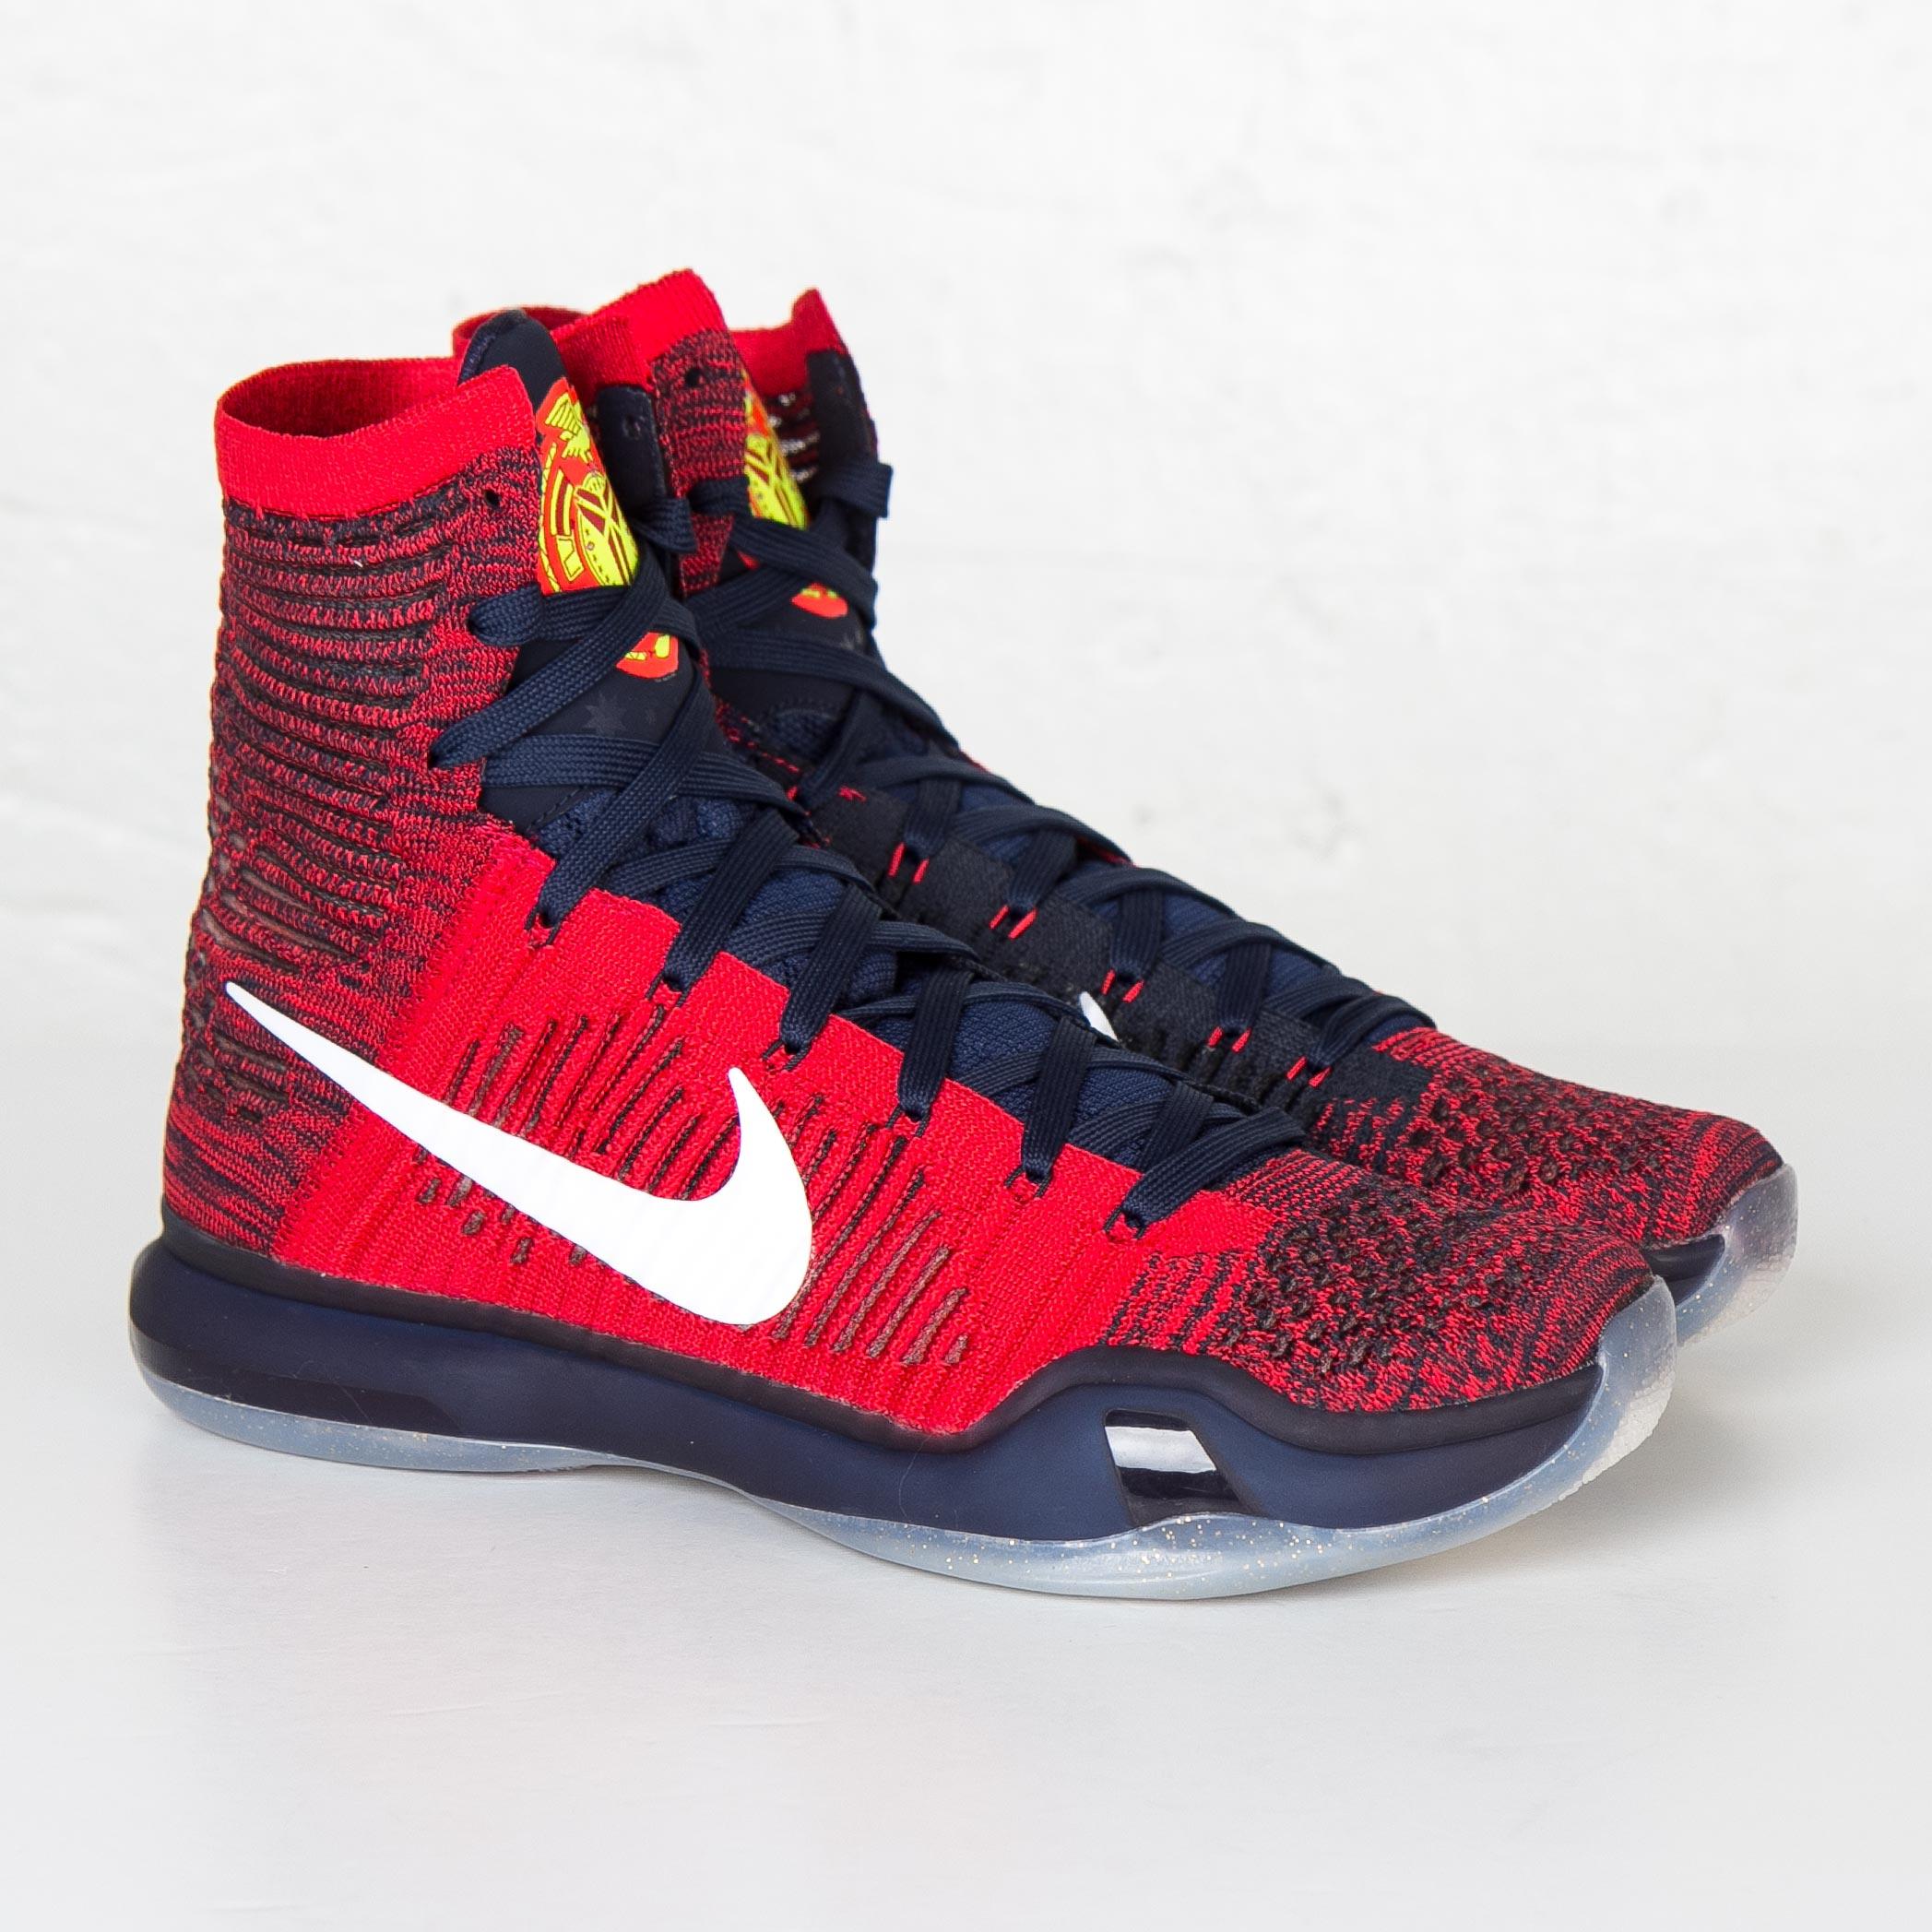 competitive price cc852 d89f5 Nike Kobe X Elite